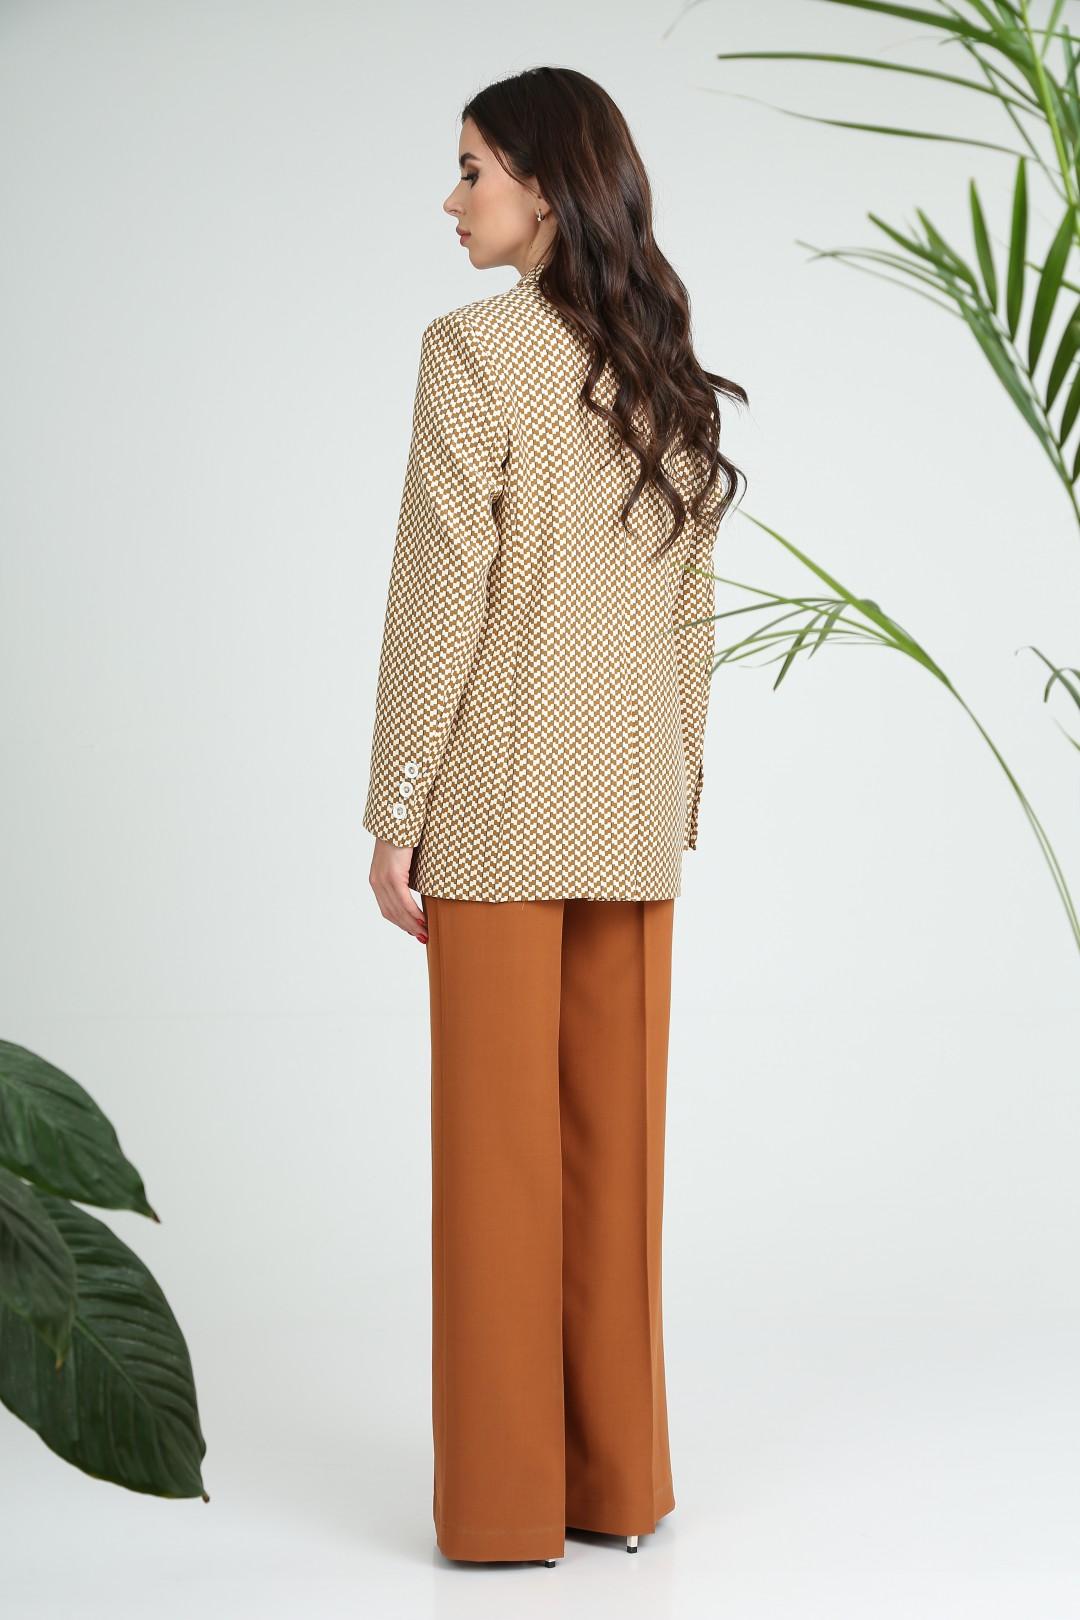 Жакет SandyNa 13934 желто-коричневый